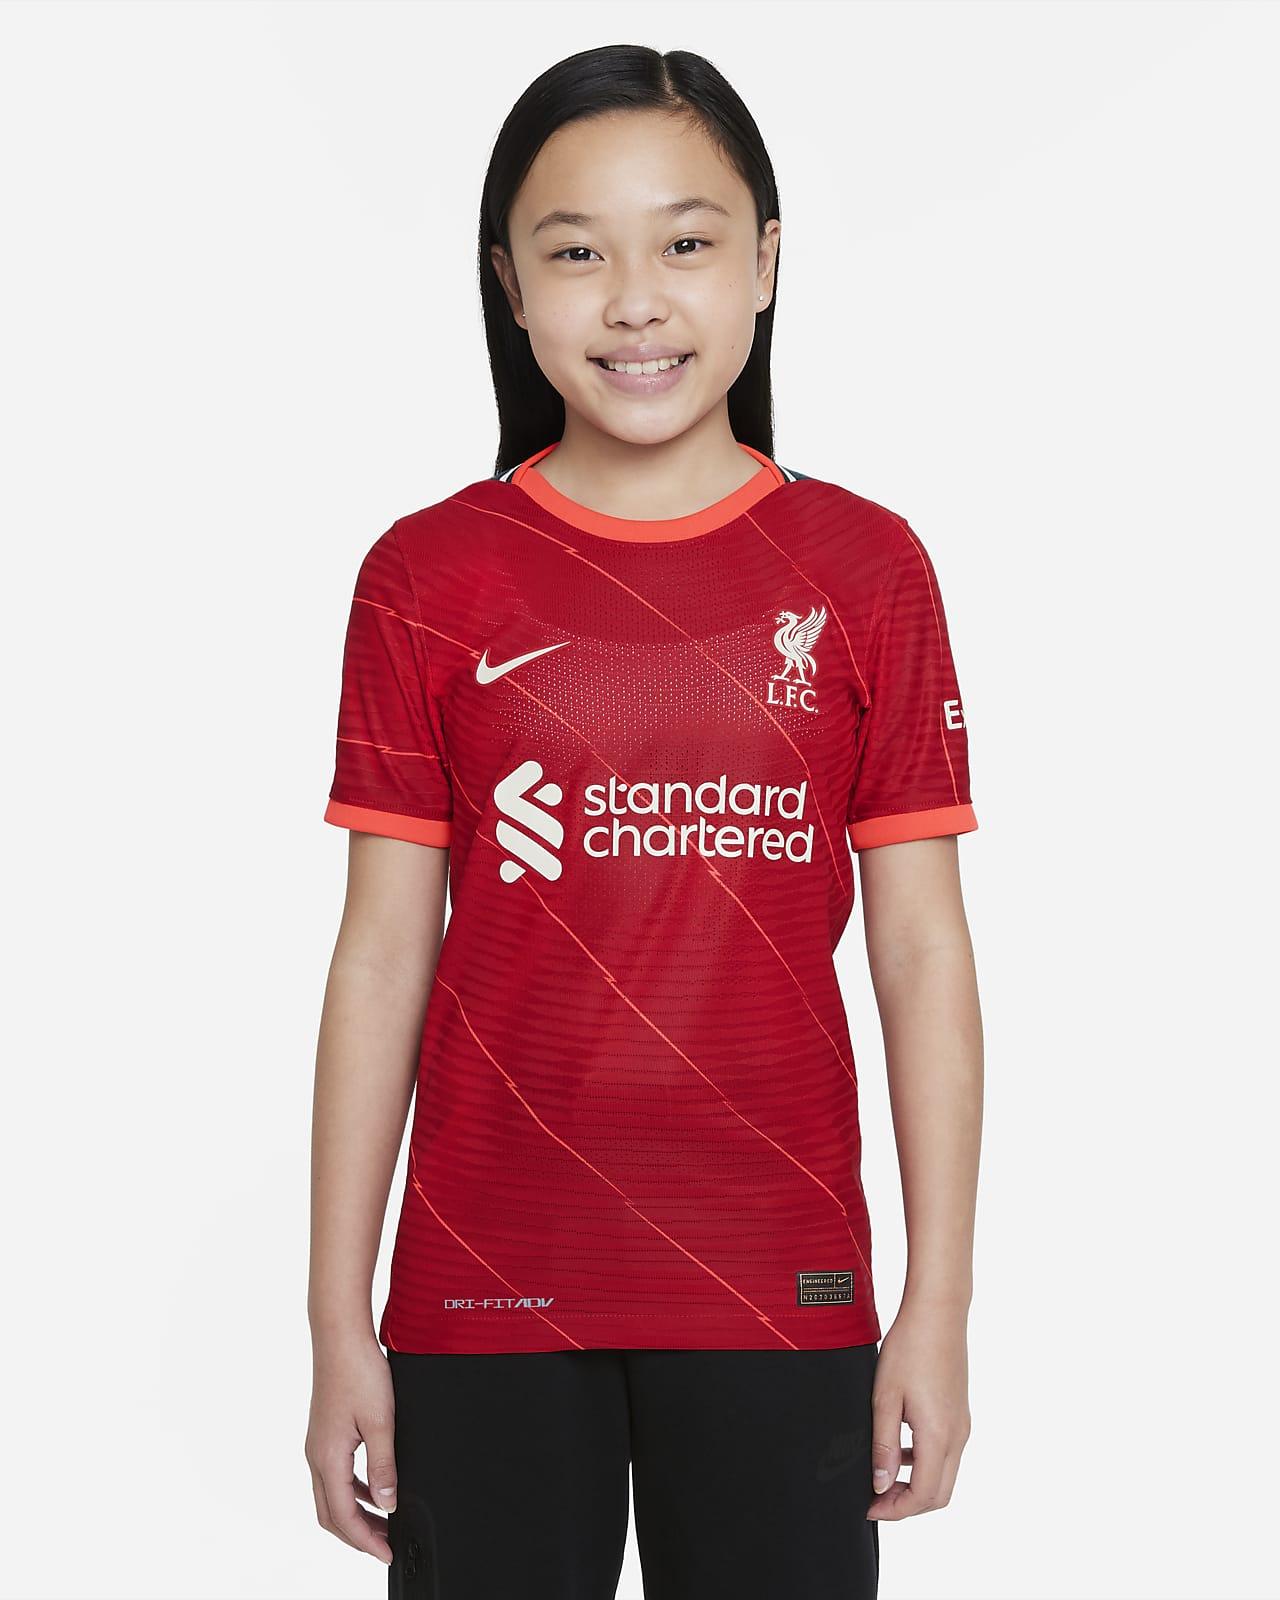 Liverpool FC 2021/22 Match Thuis Nike ADV voetbalshirt met Dri-FIT voor kids